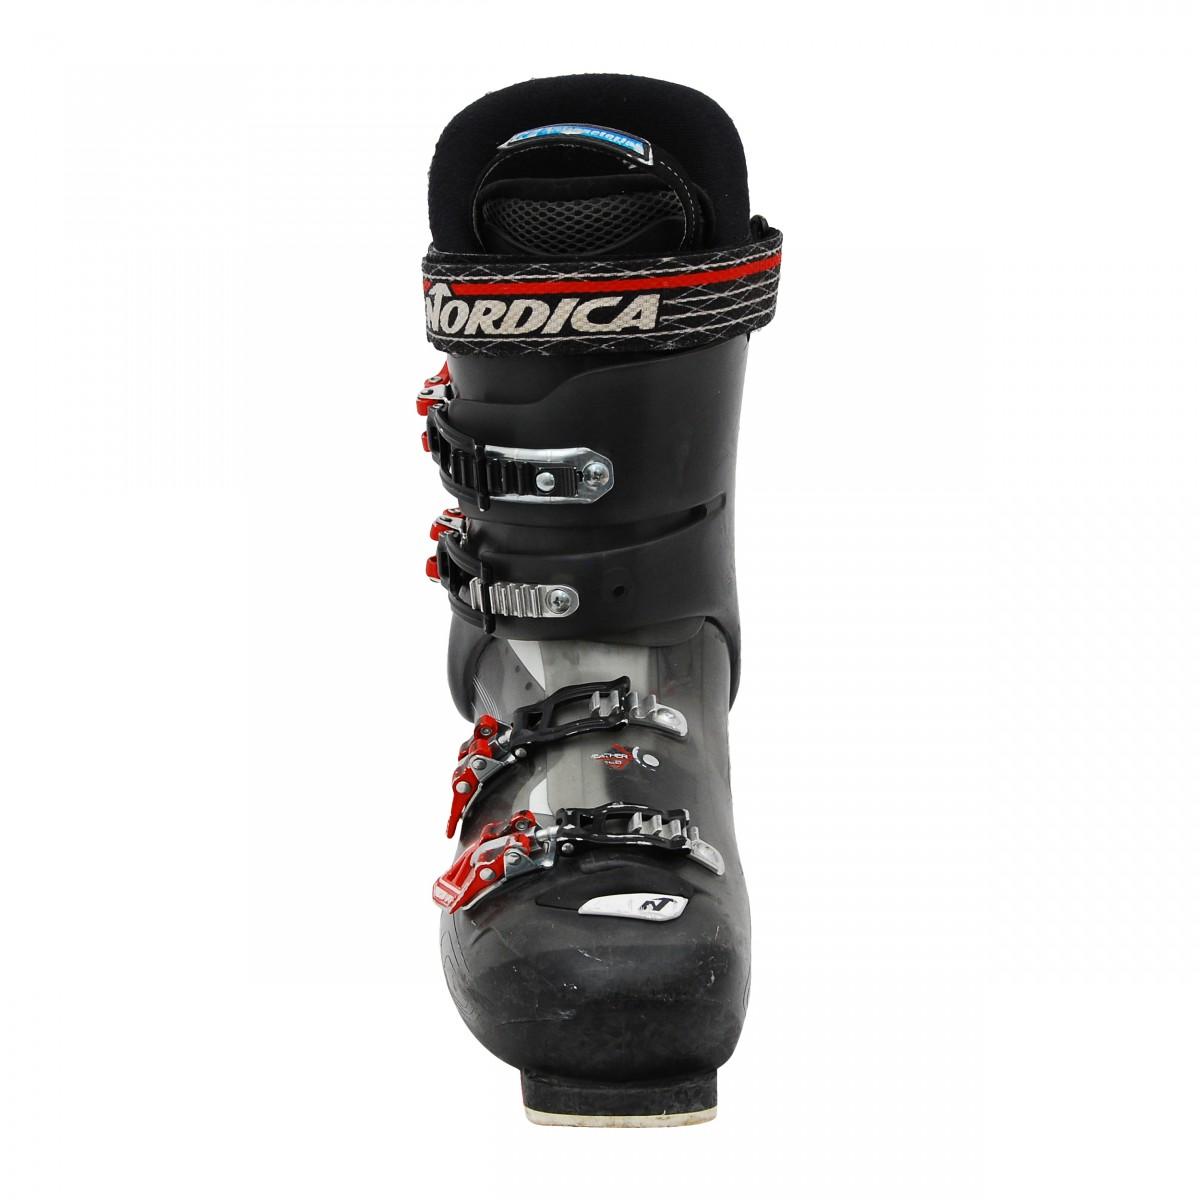 Chaussure-Ski-alpin-occasion-NORDICA-Speedmachine-110R-noir-rouge miniature 5